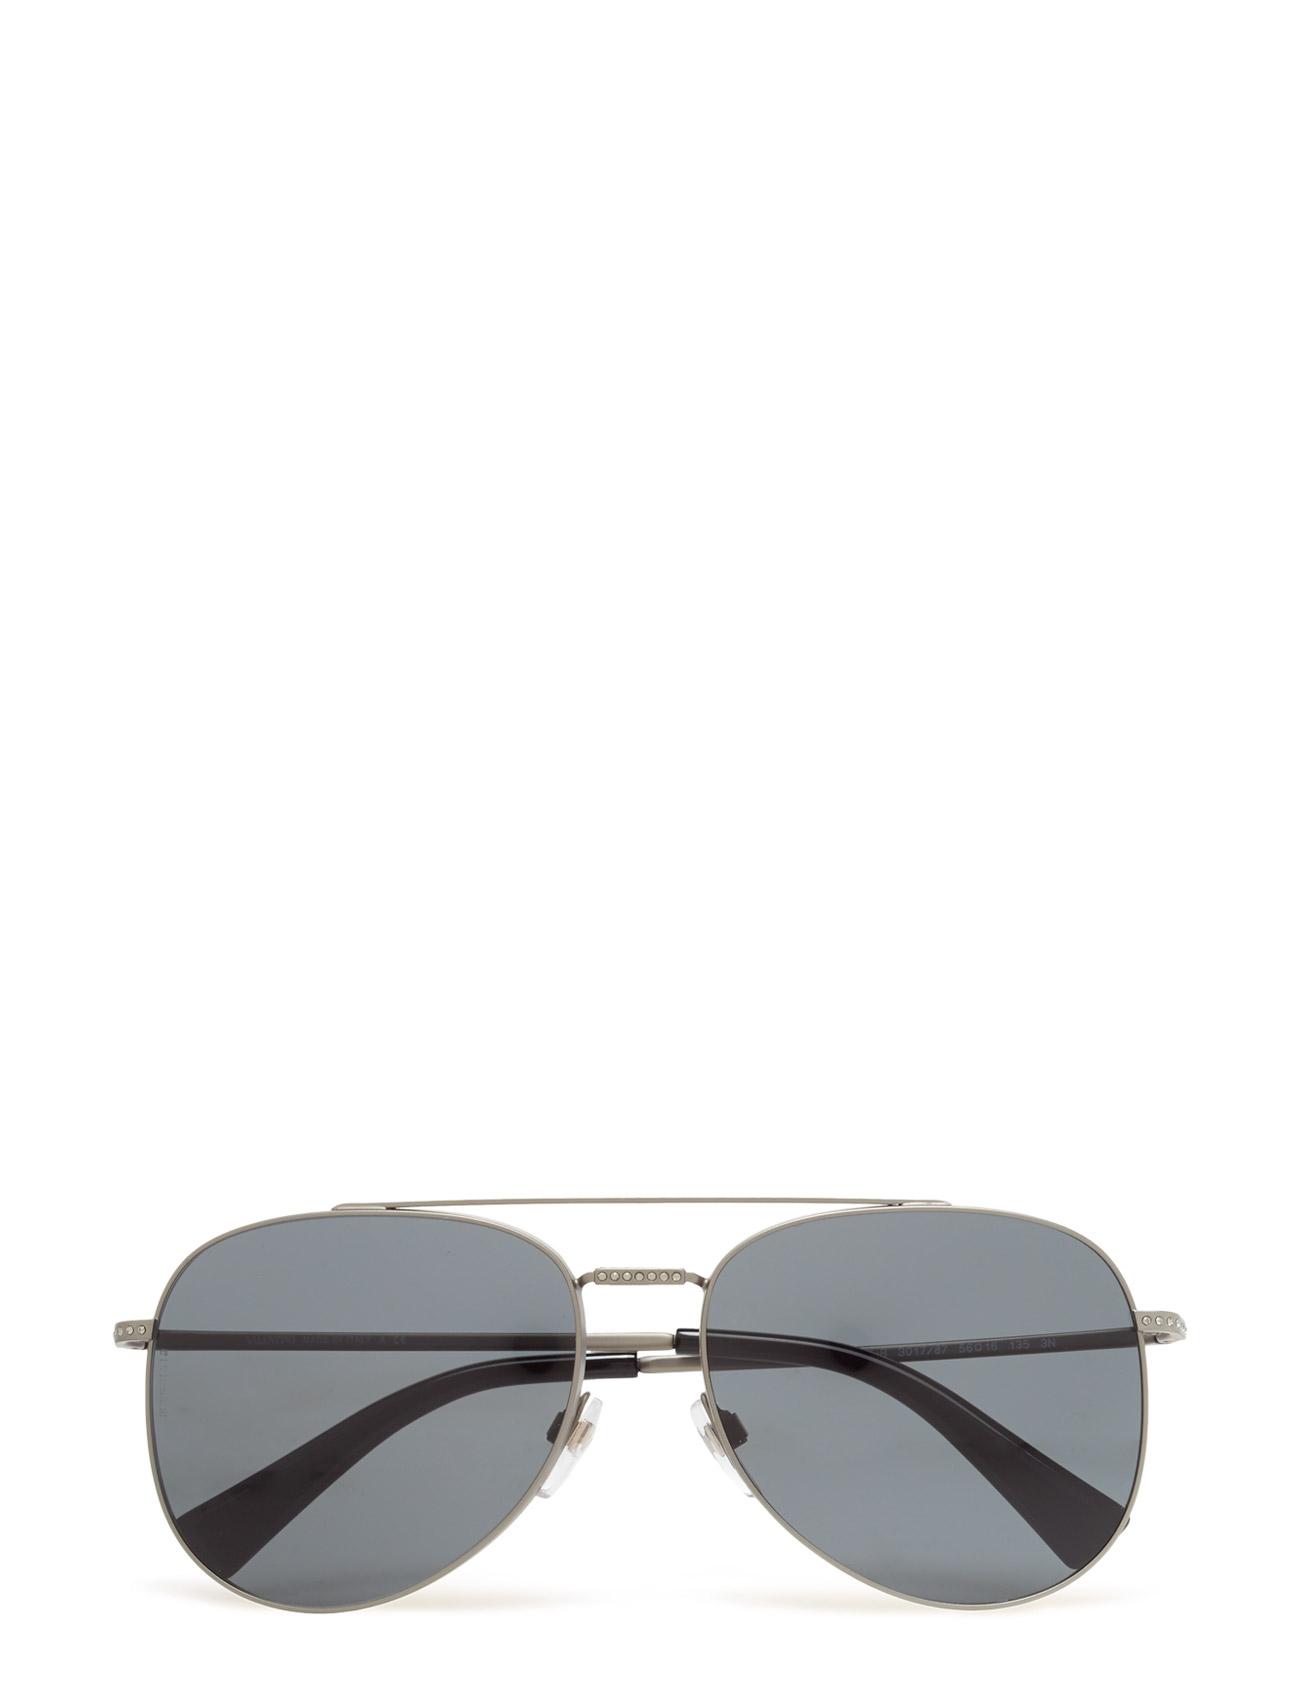 valentino sunglasses – Glamtech på boozt.com dk